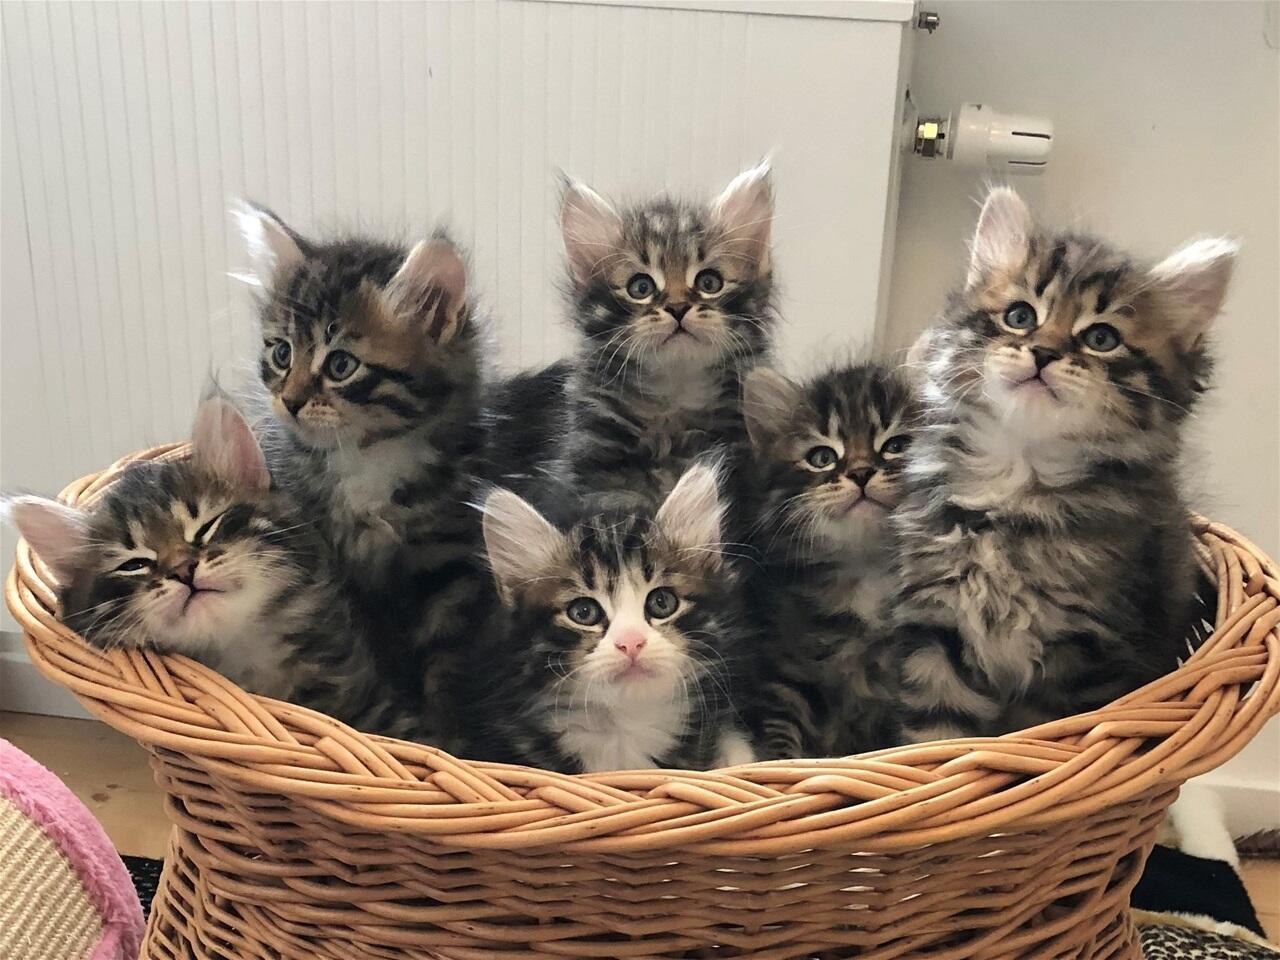 Mengharukan, Inilah Beberapa Alasan Kenapa Induk Kucing Memakan Anaknya Sendiri!